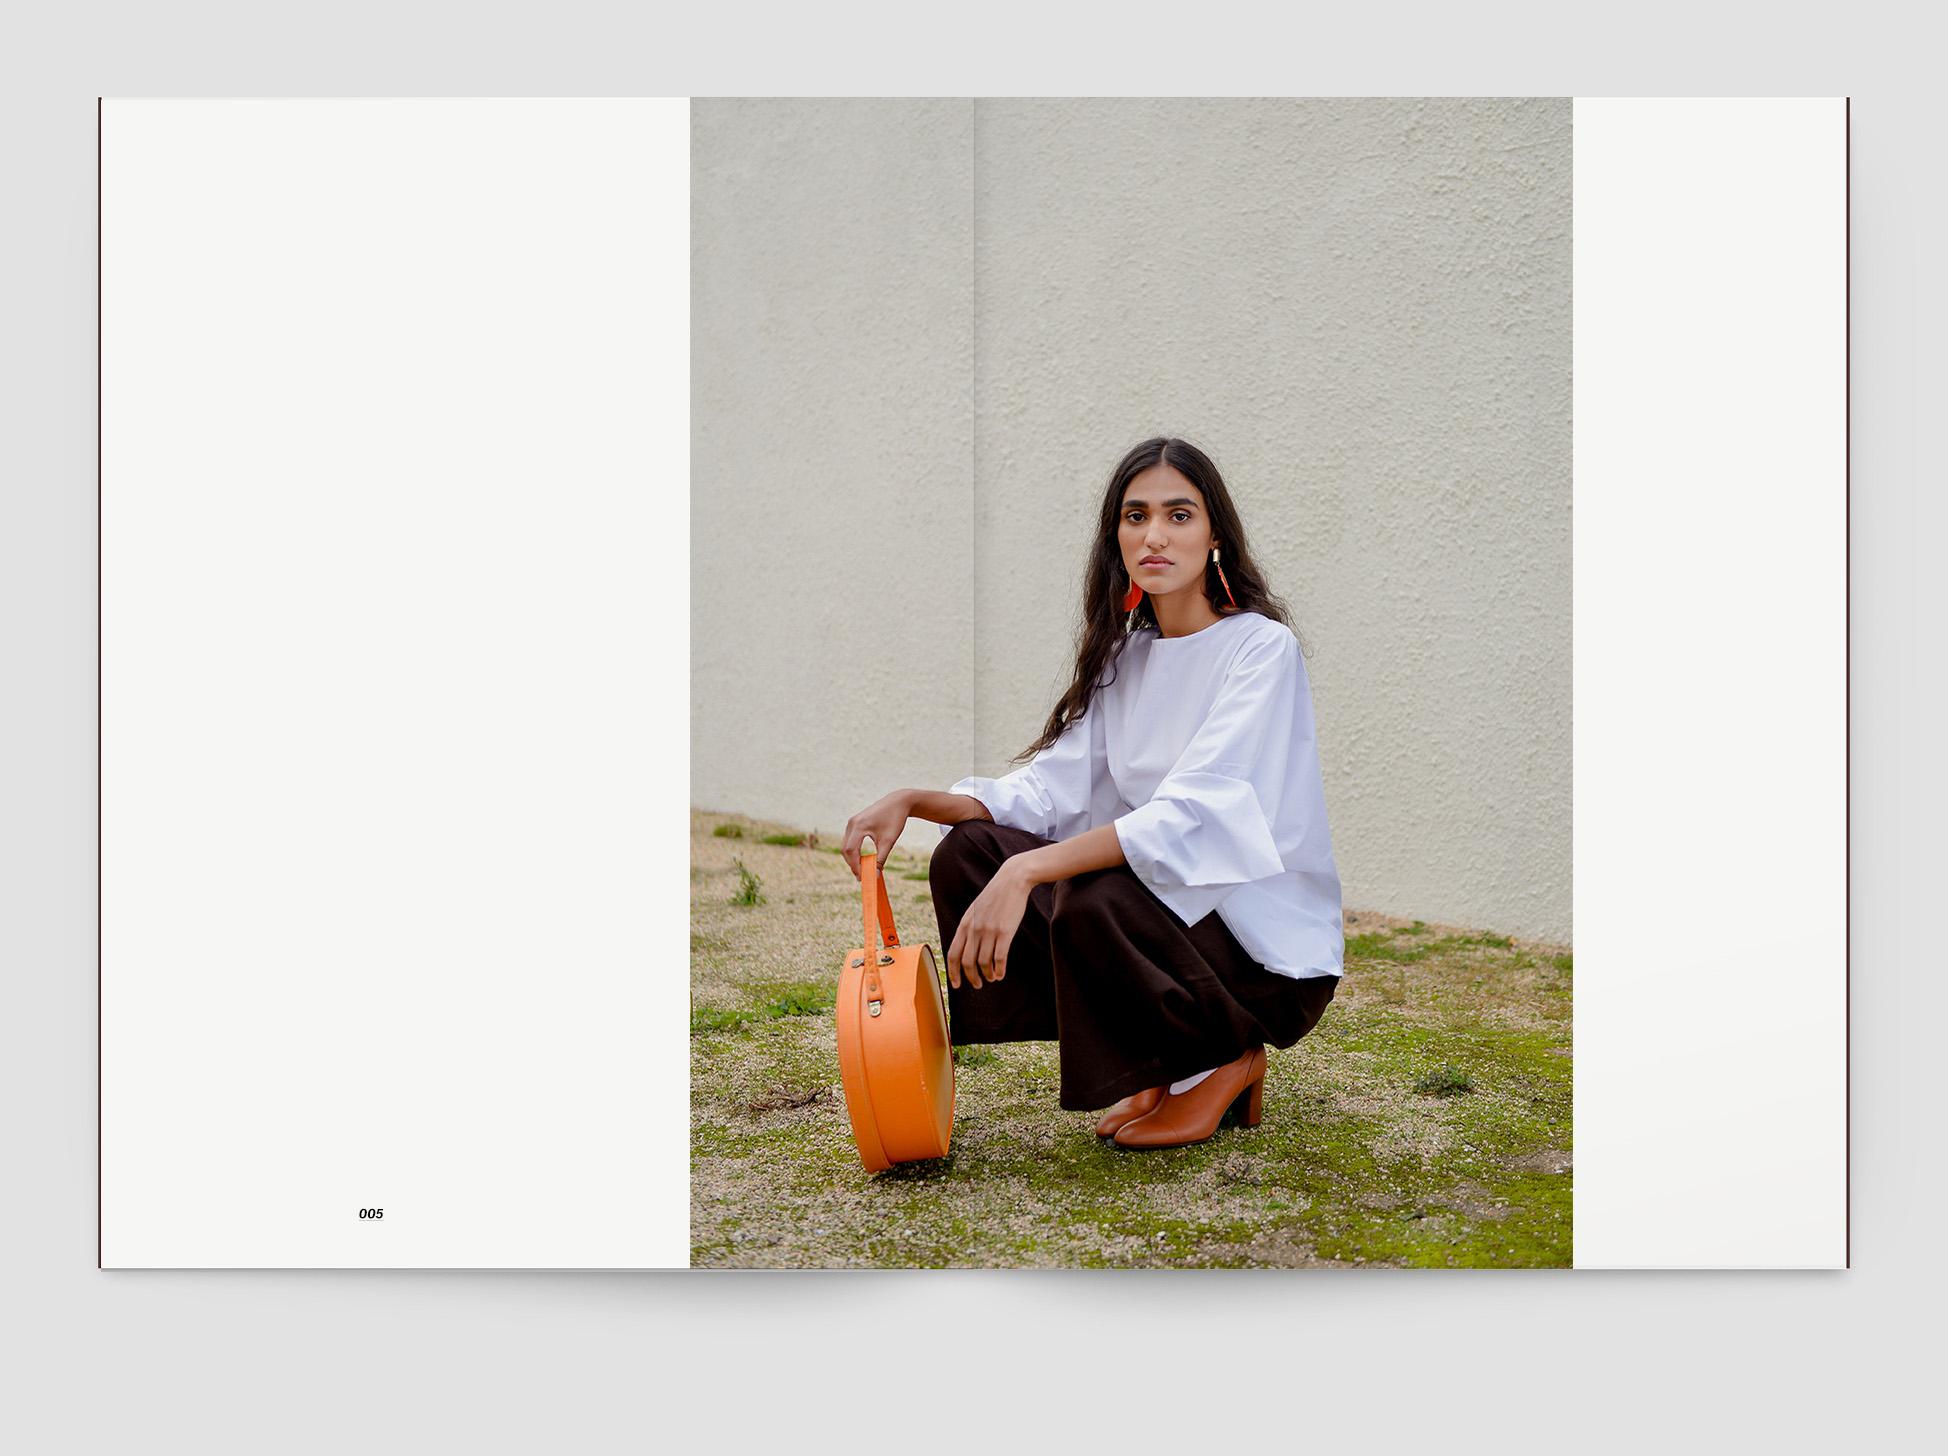 005 Flare khadi cotton shirt  005 Flare linen pant